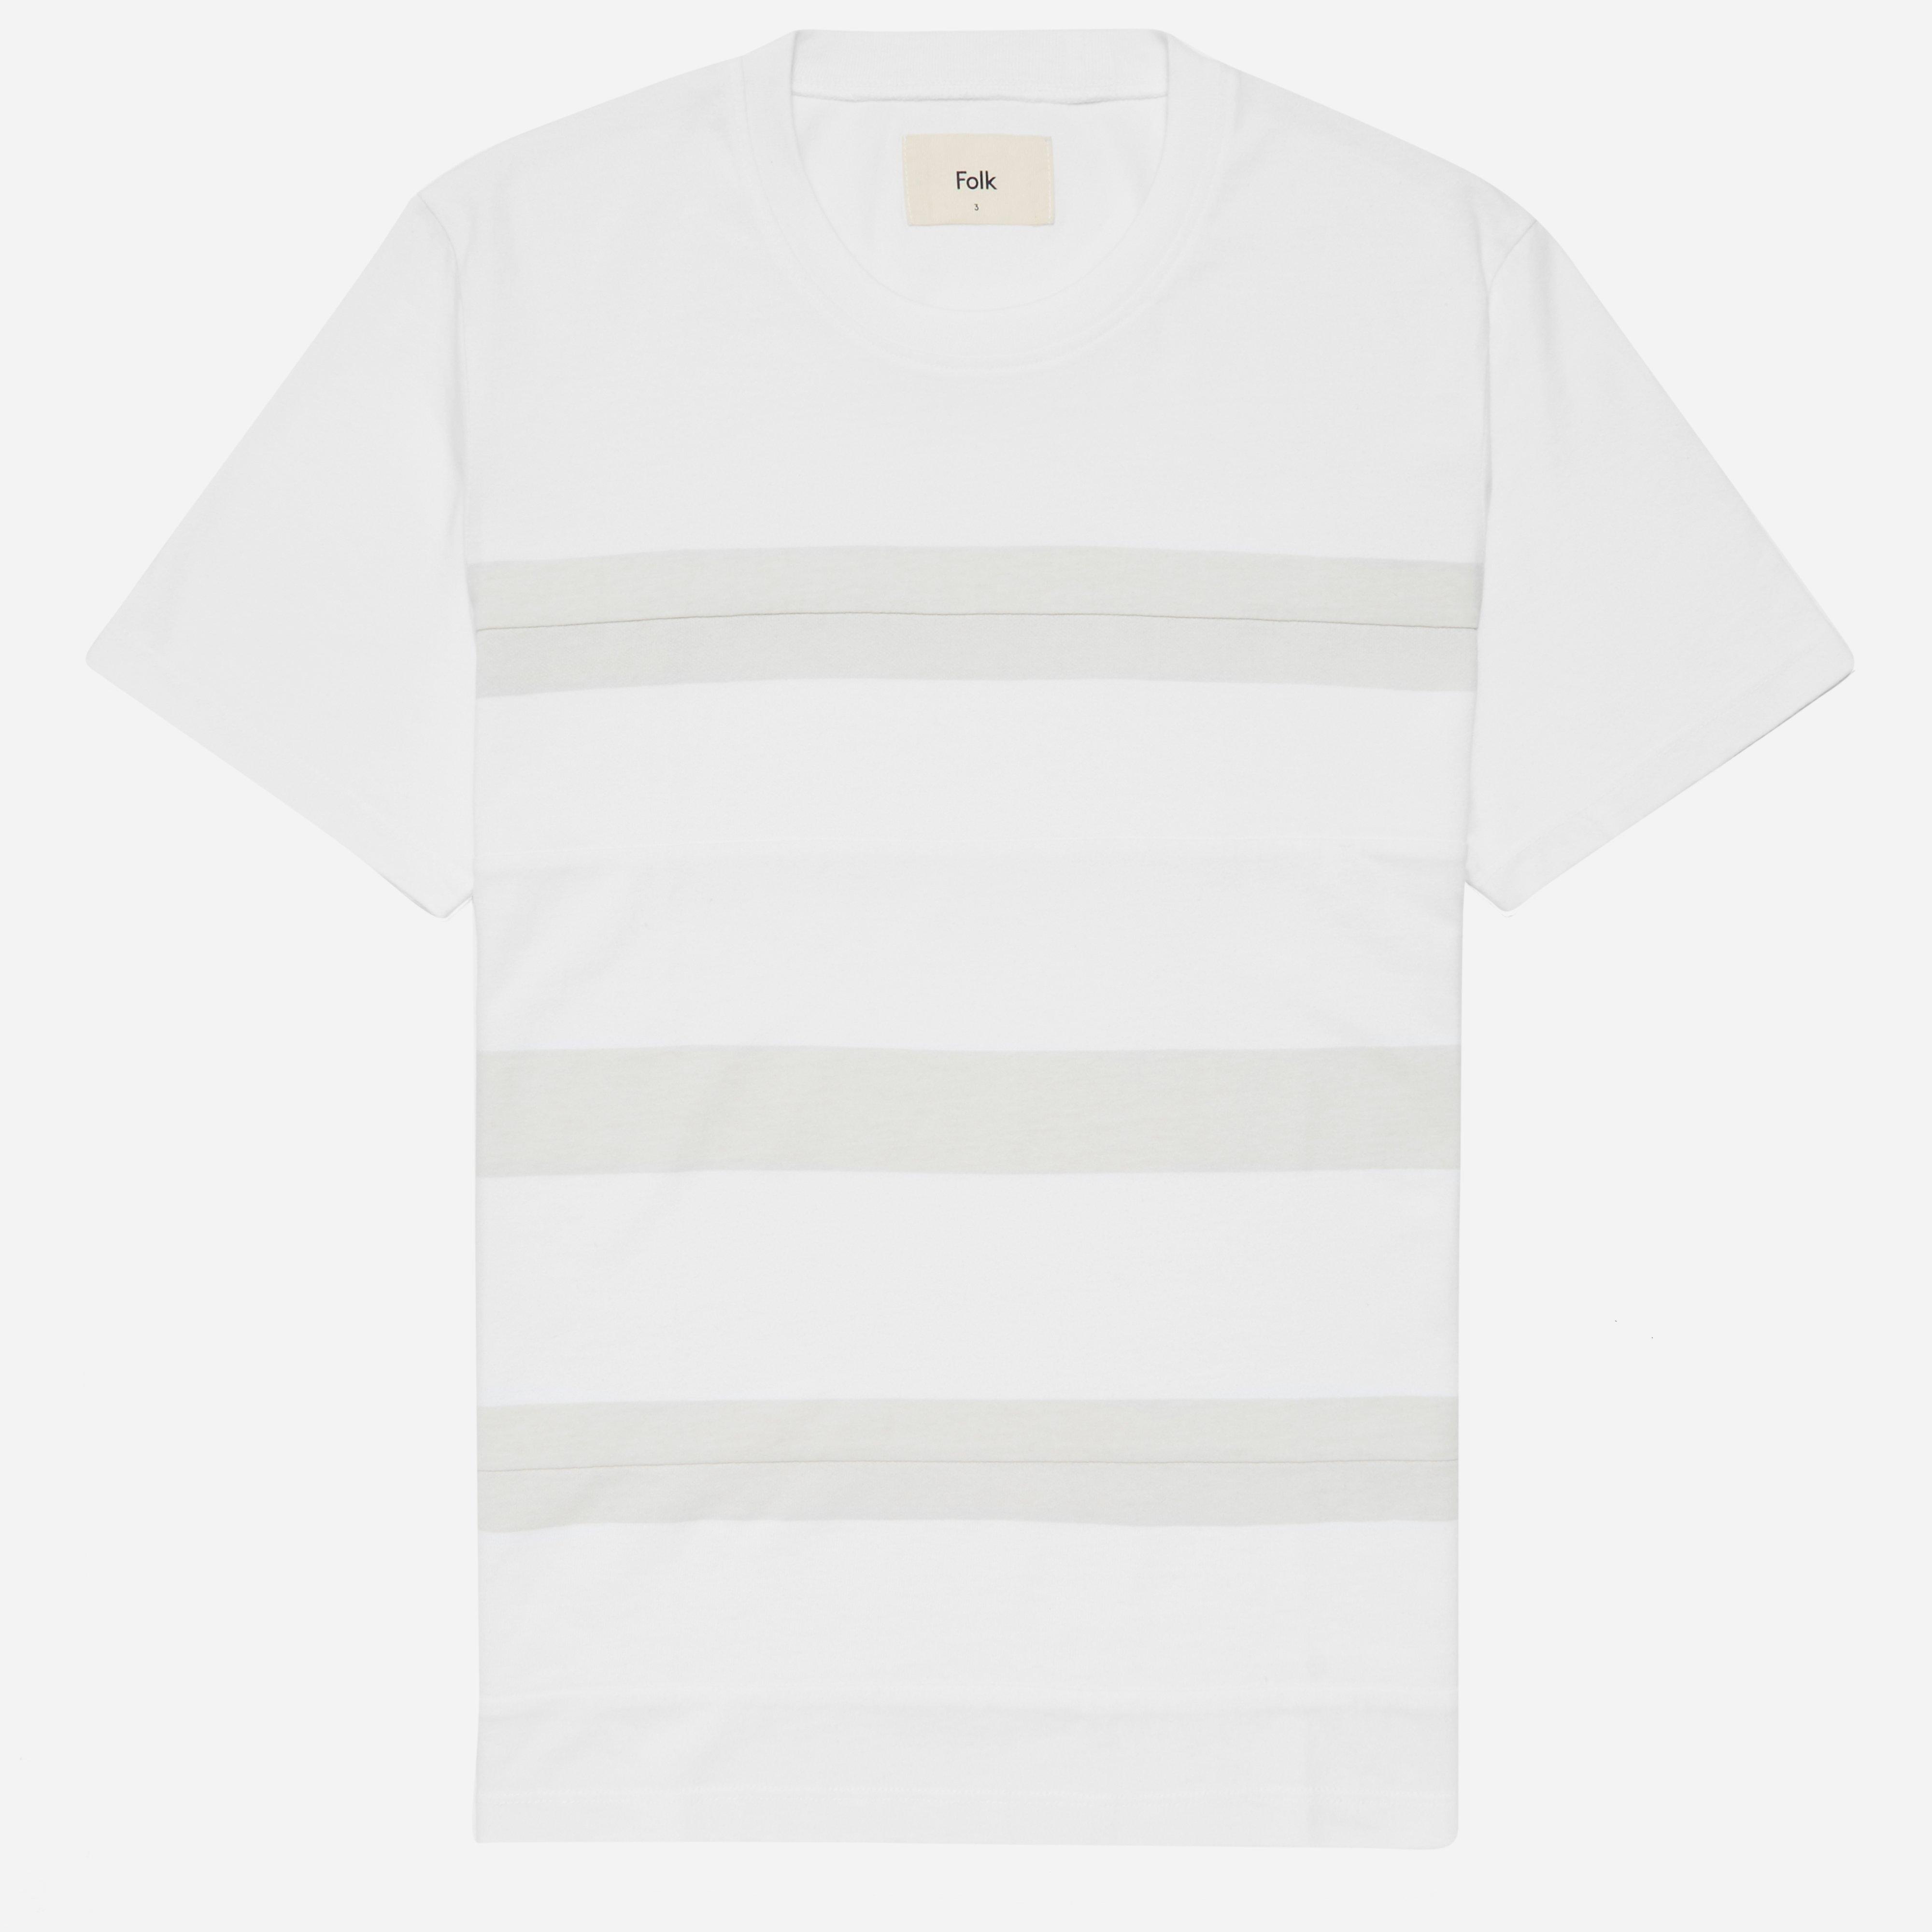 Folk Overlap T-shirt